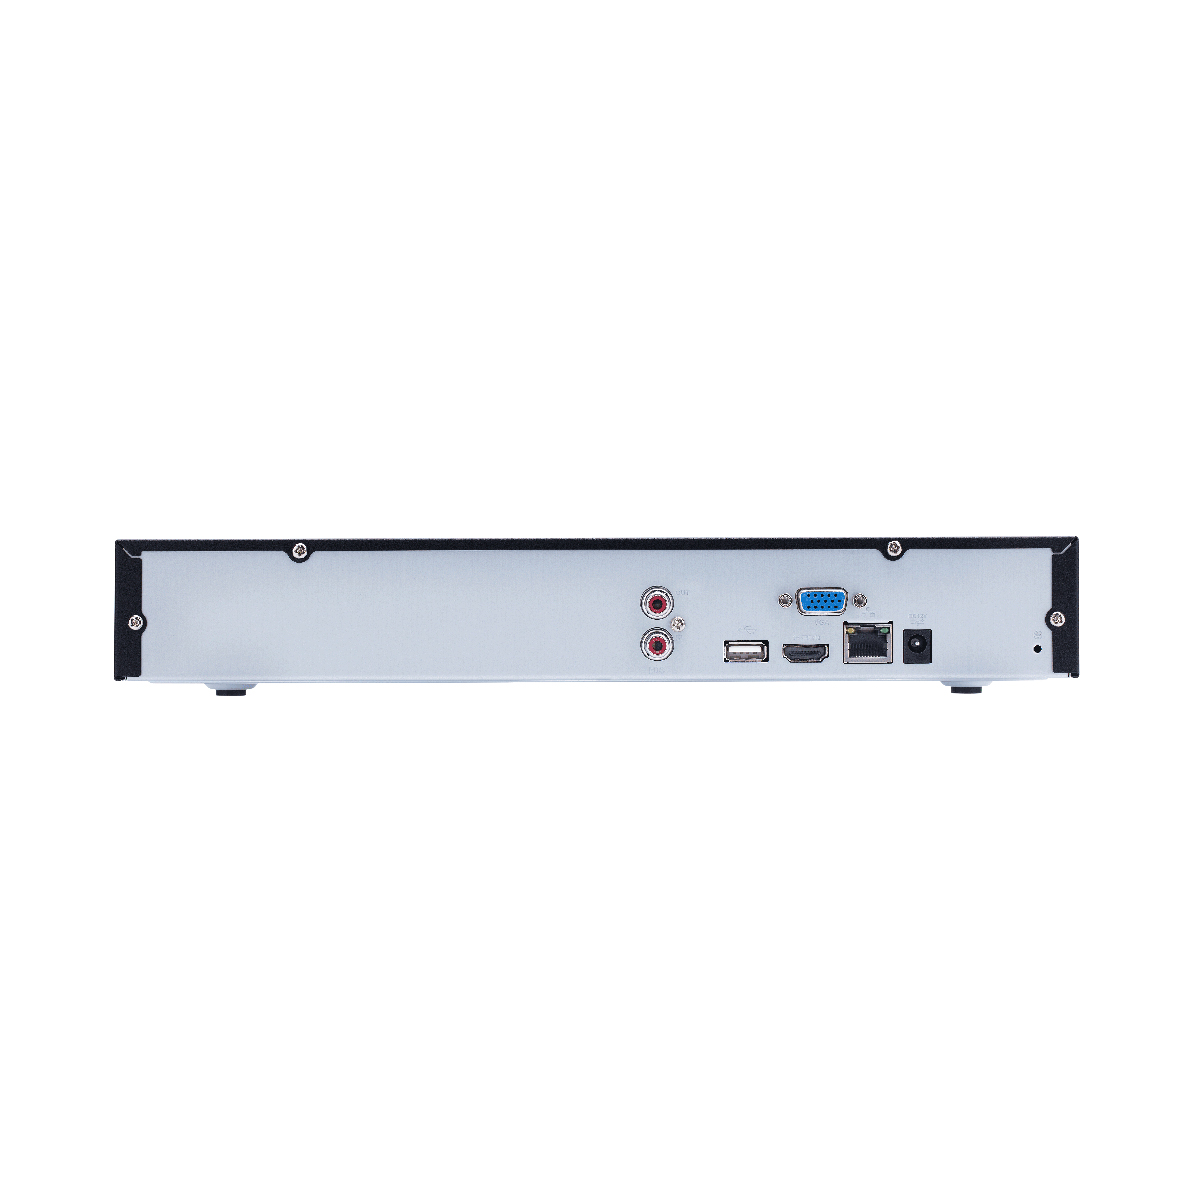 NVR, HVR Stand Alone Intelbras NVD 1008 8 Canais, para Camera IP, OnVif